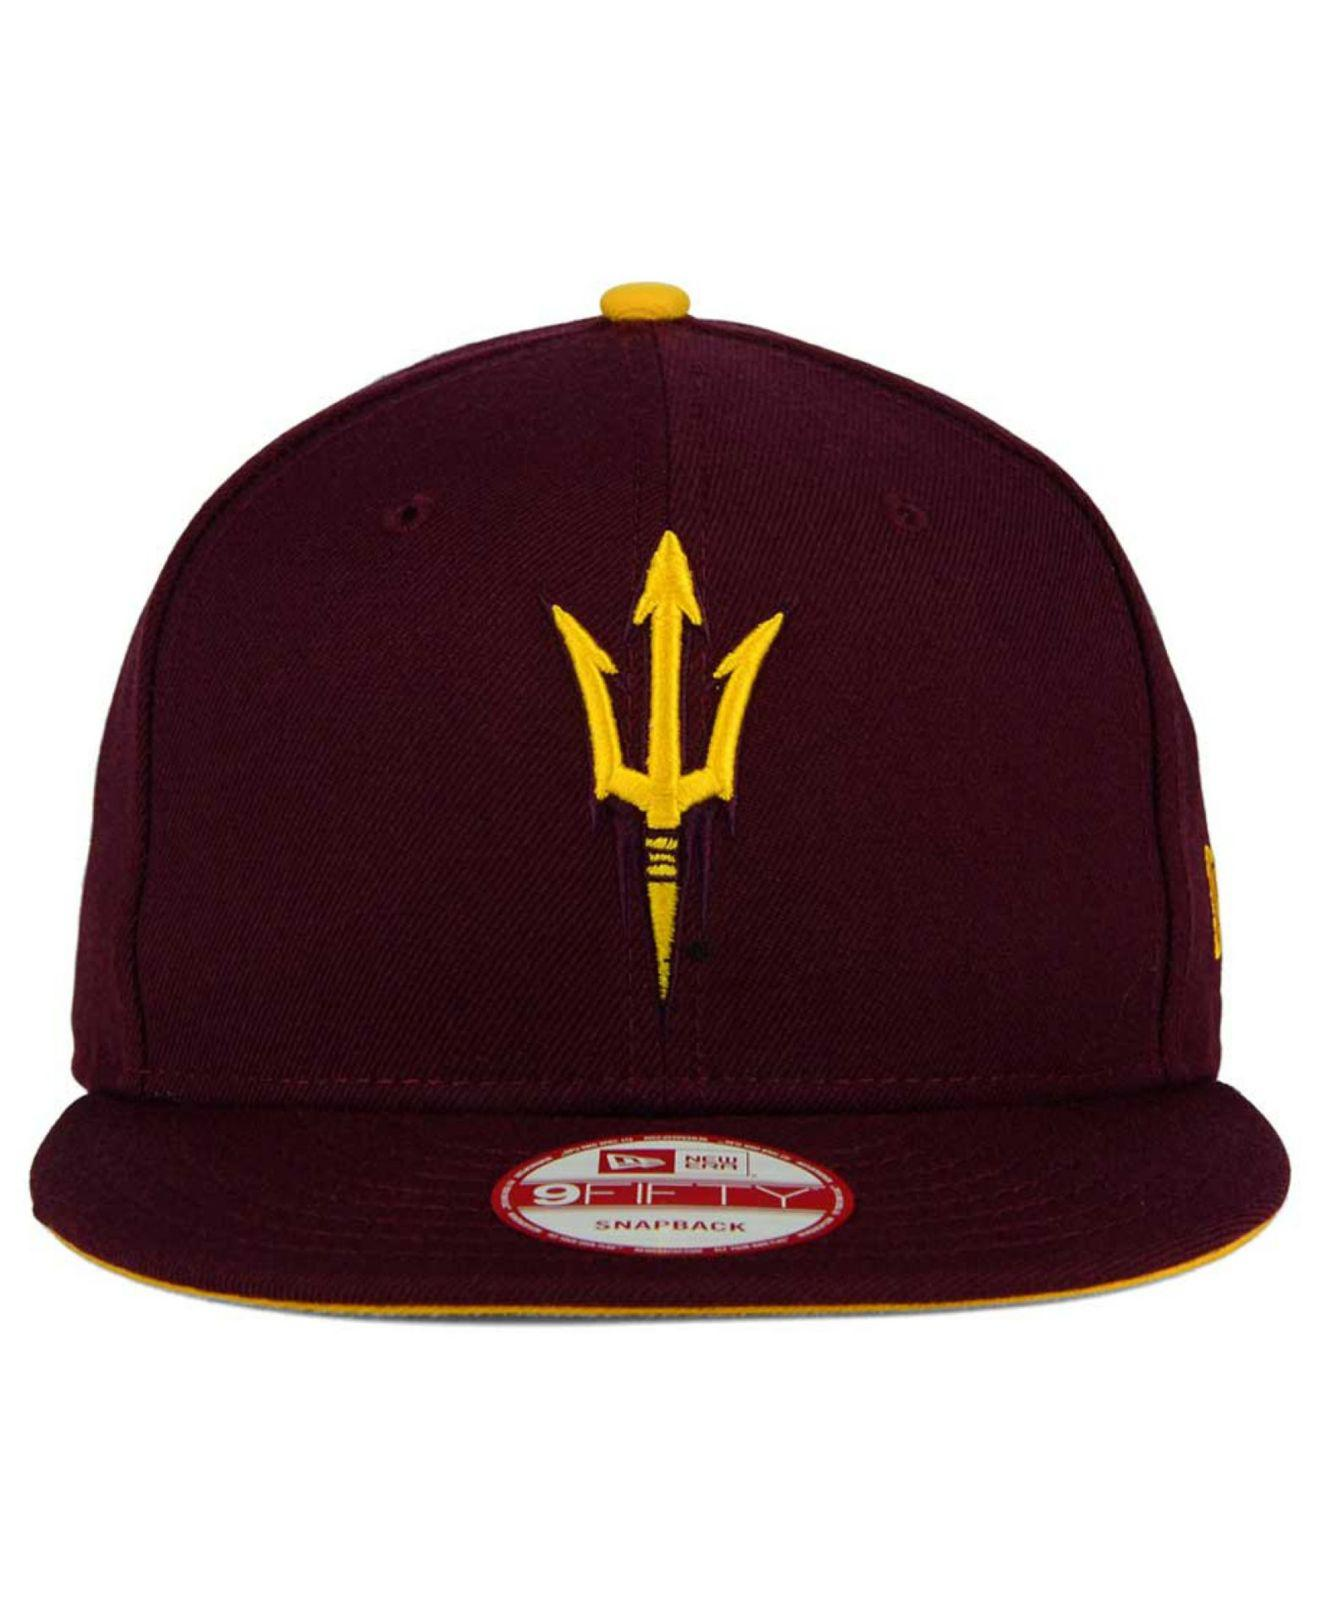 best website 96bc5 dcb82 ... usa lyst ktz arizona state sun devils core 9fifty snapback cap in  purple for men 1322f